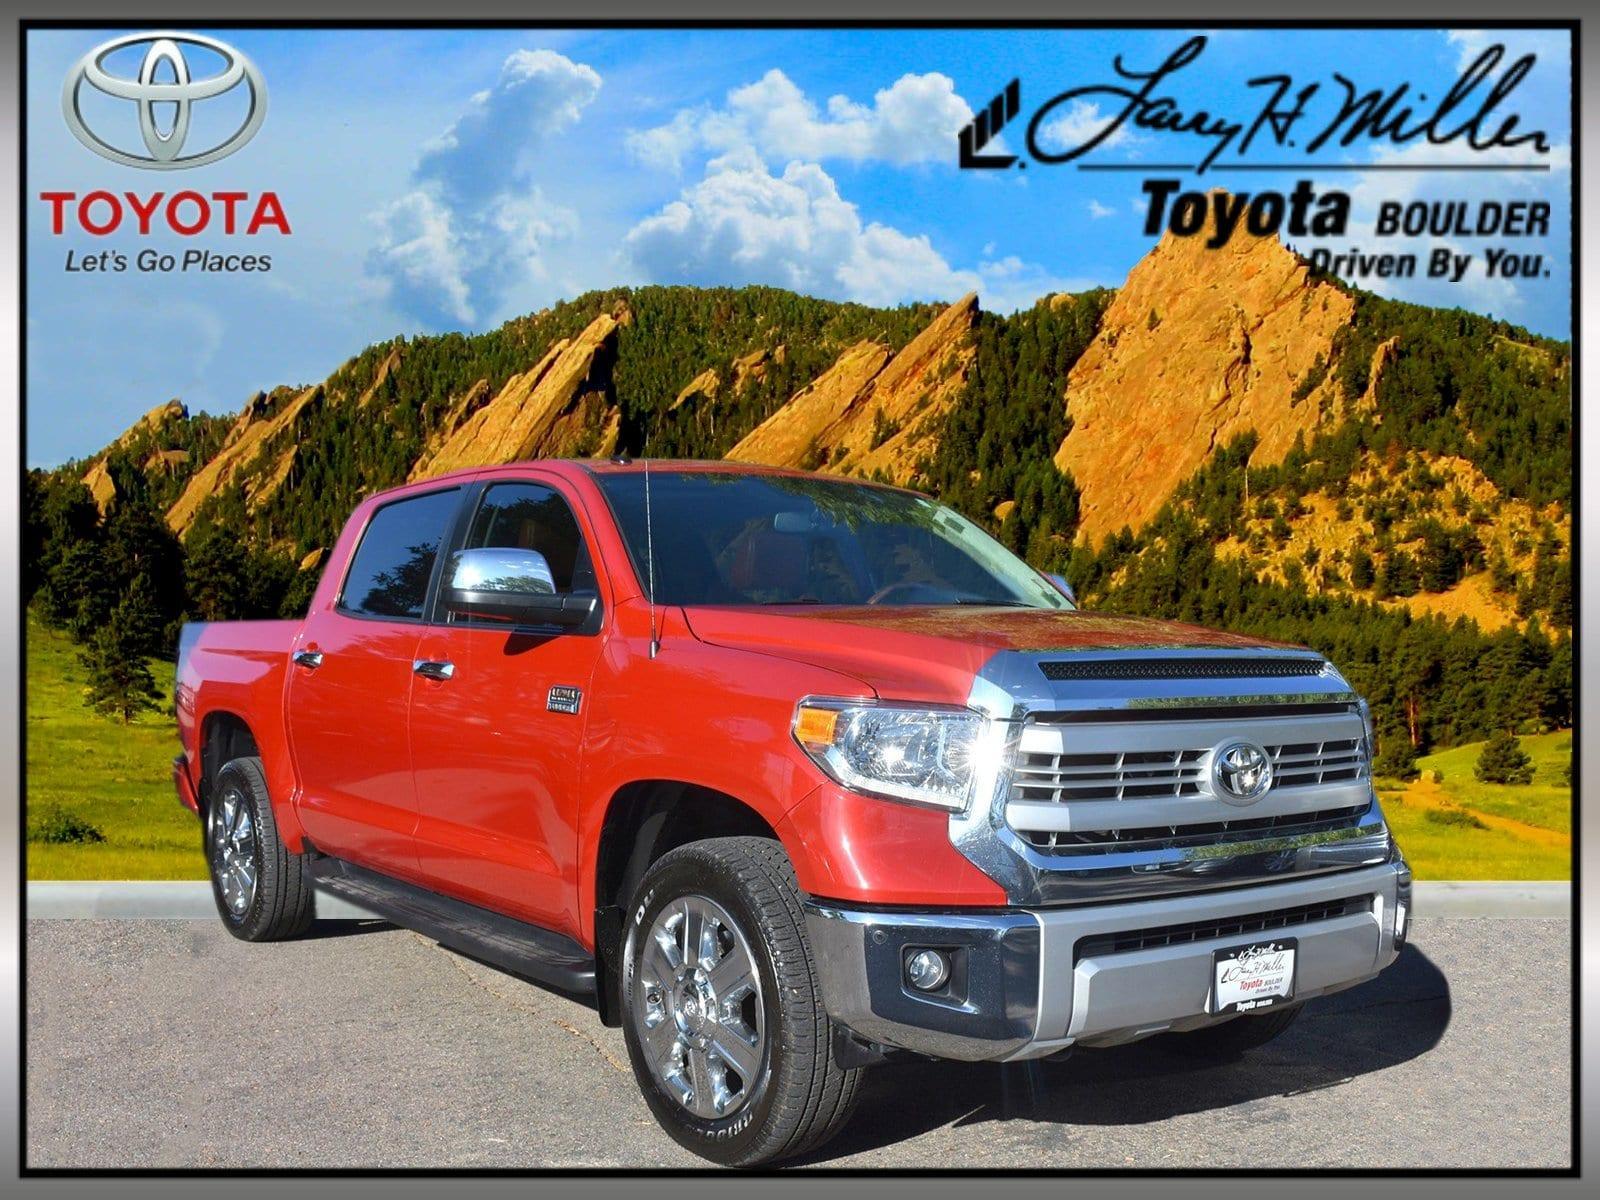 Toyota Tundra 4WD Truck 1794 2014